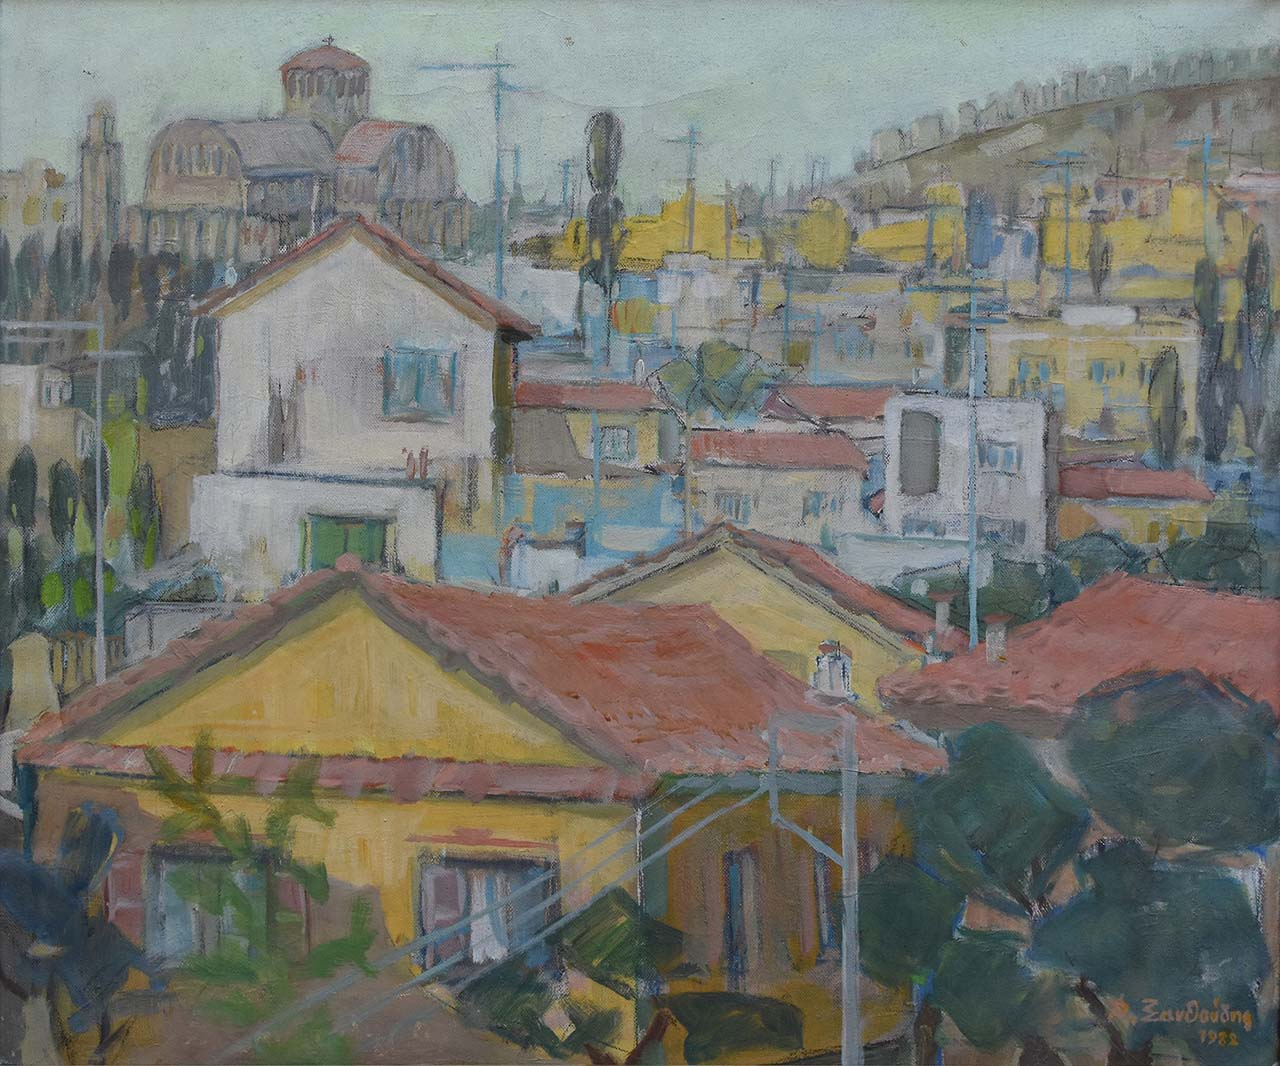 109. XANTHOUDIS Dimitrios (1917-2011)